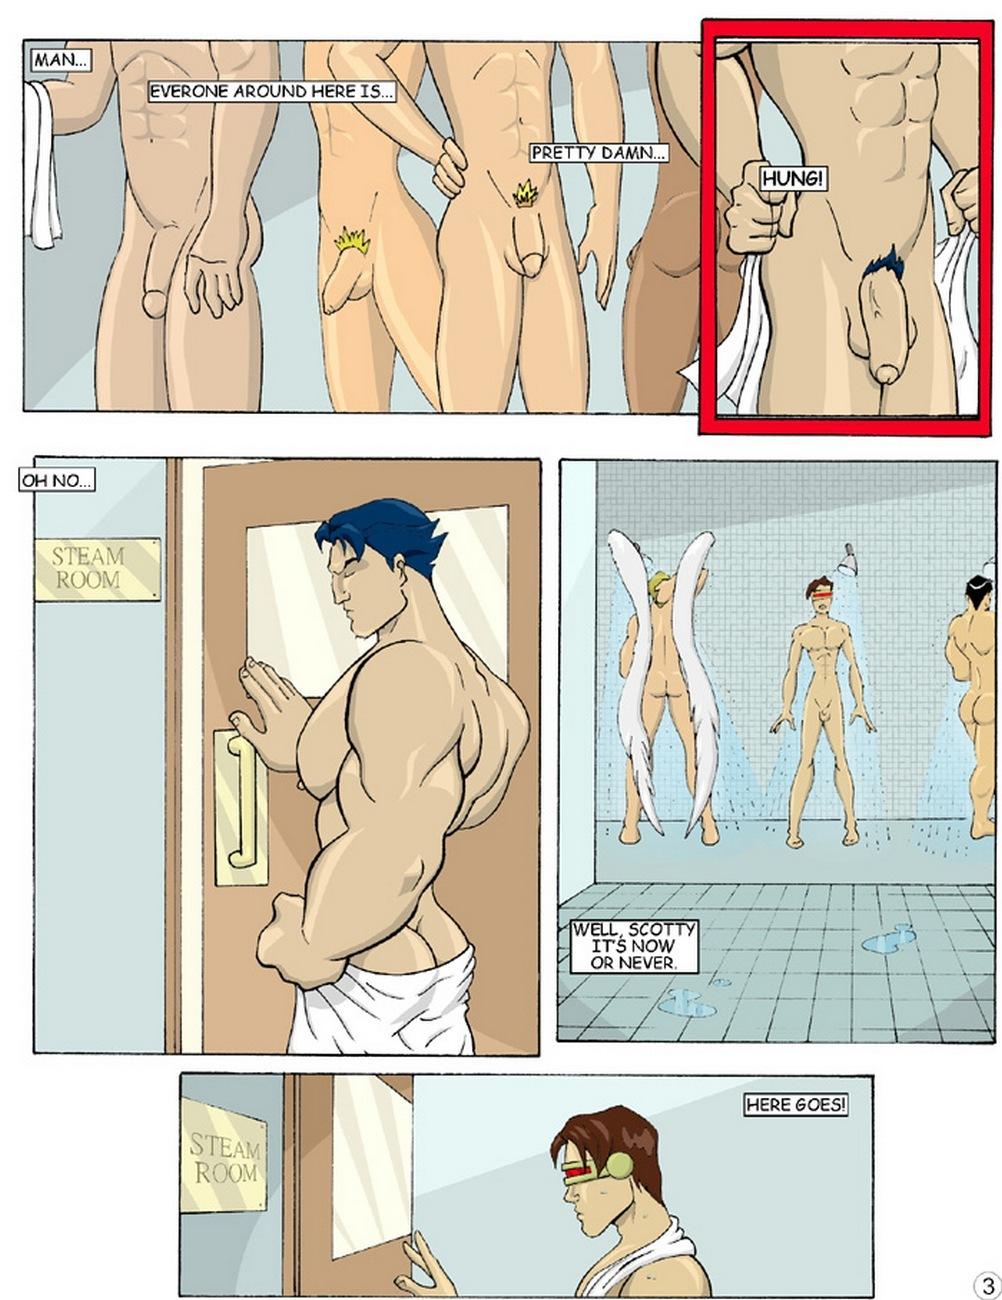 X-Men Evoloution 4 free sex comic